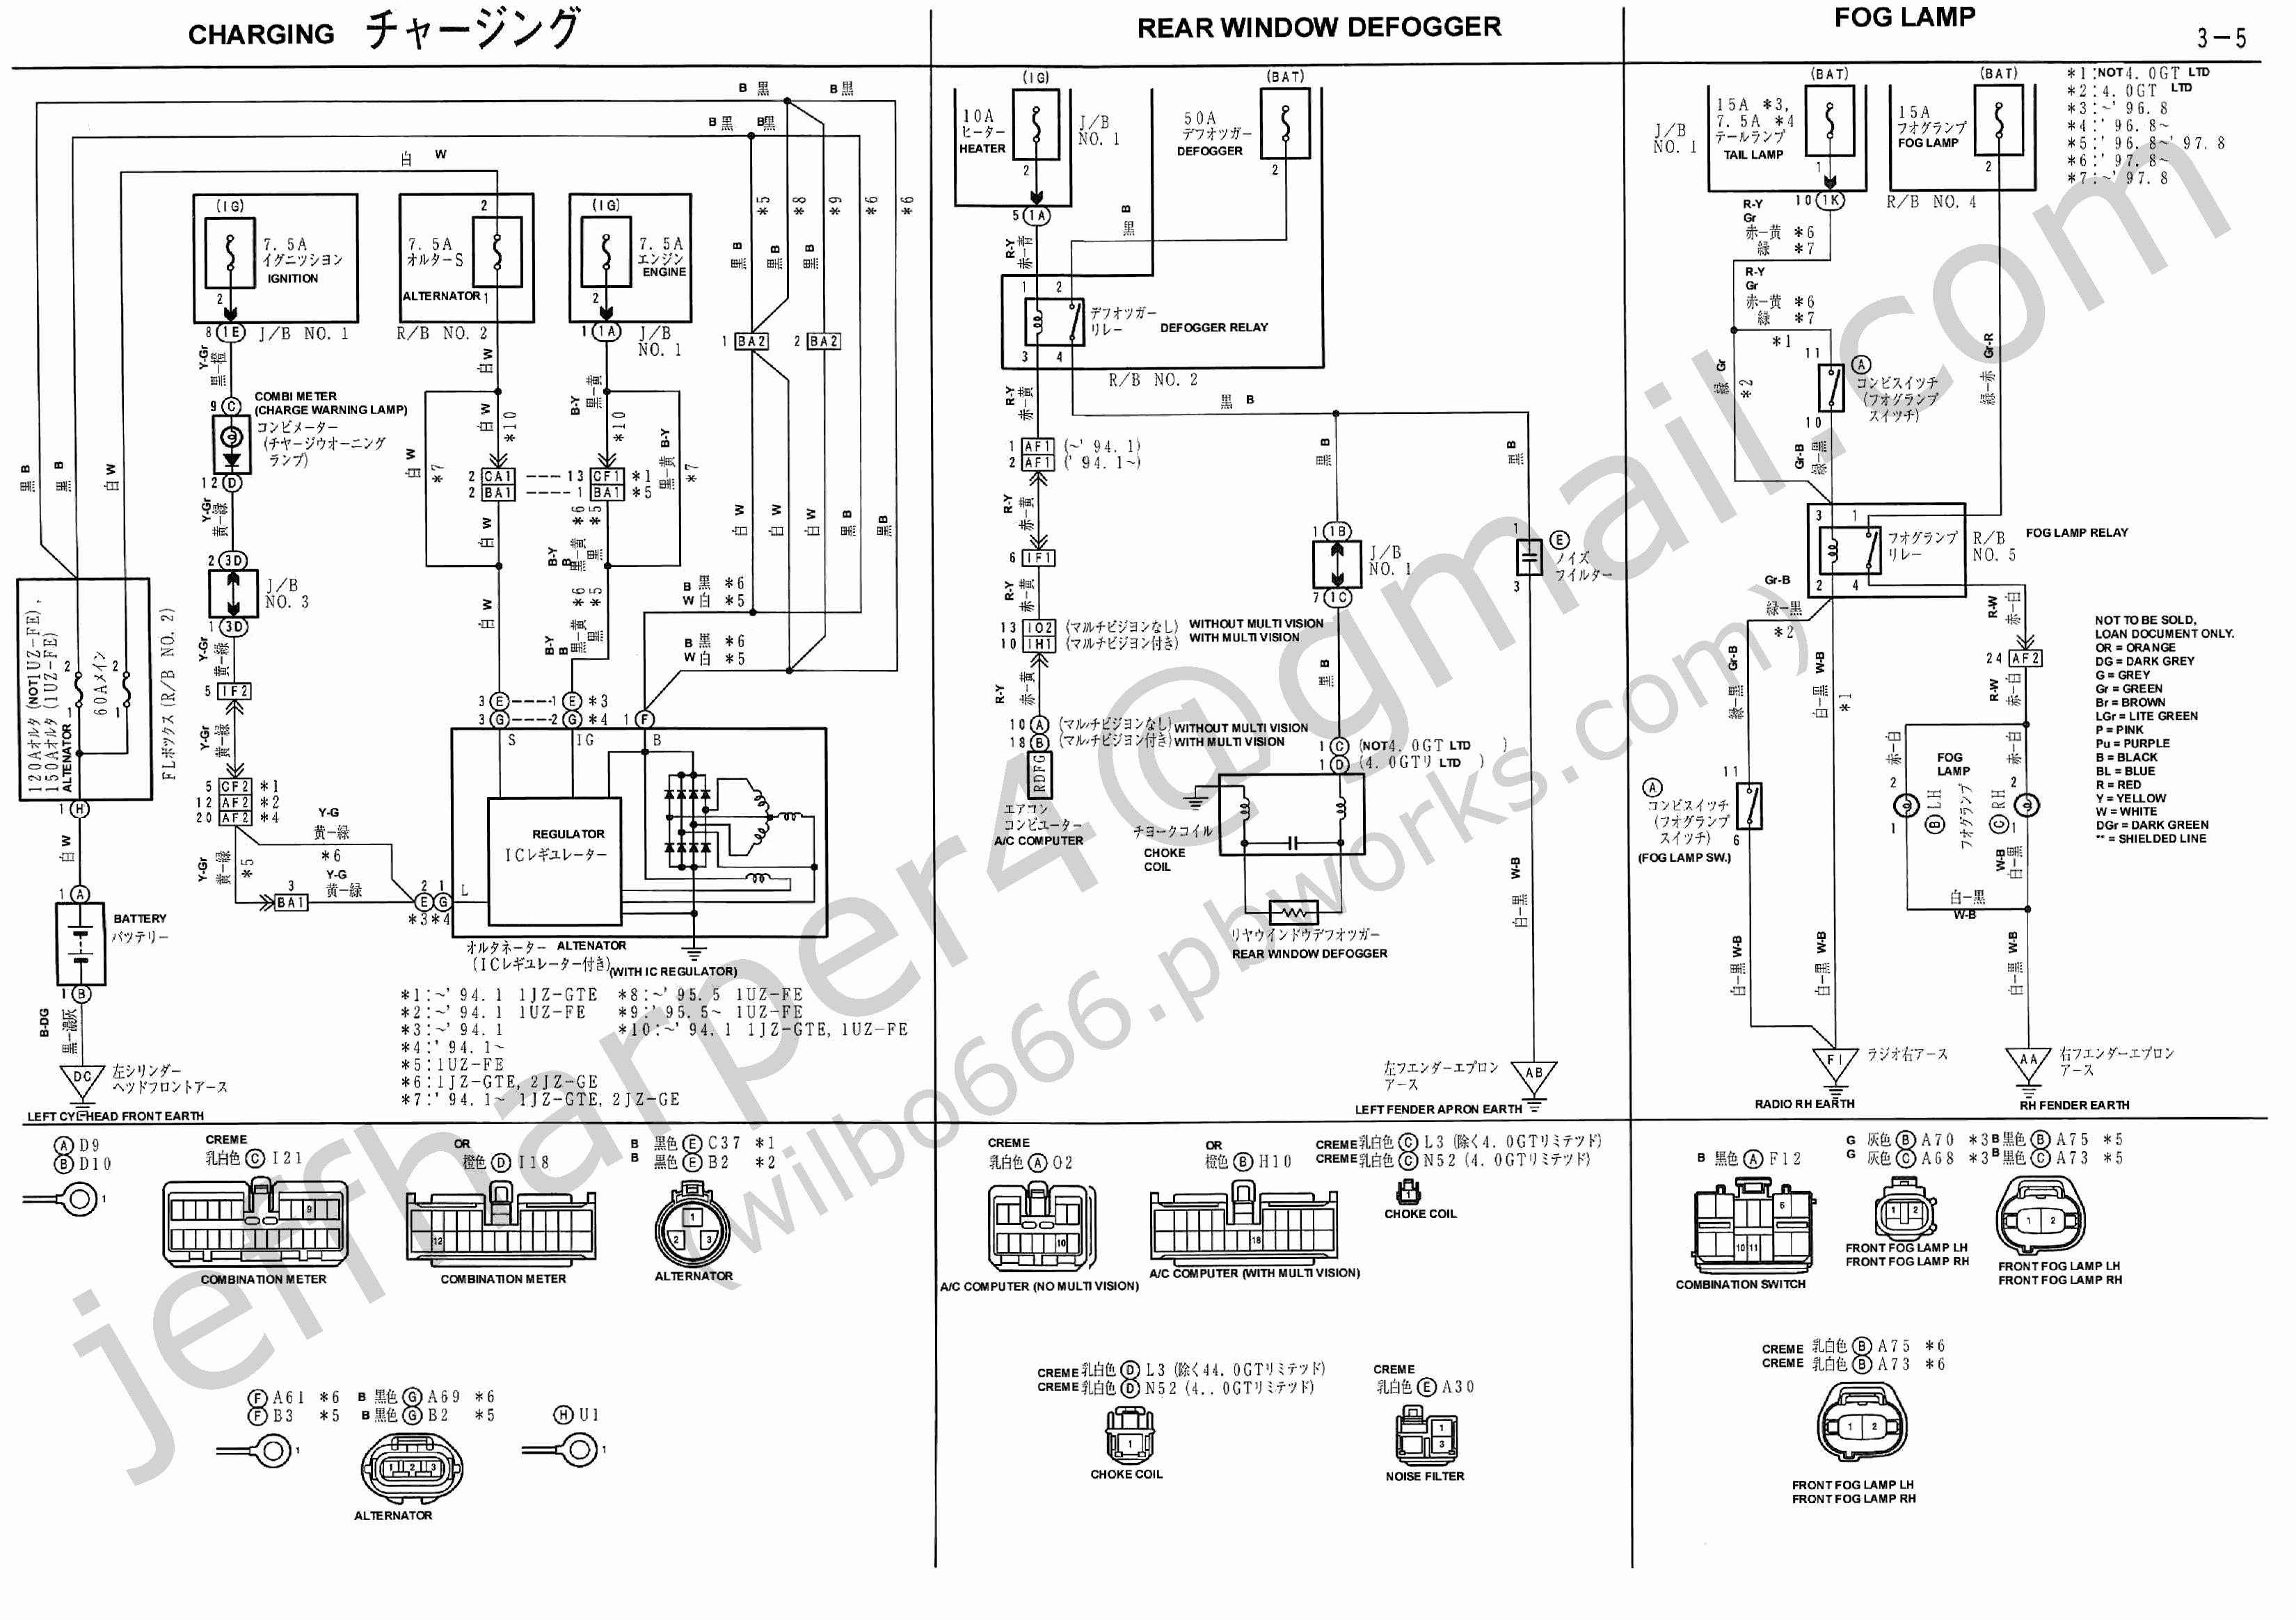 Lionel Postwar Wiring Diagrams | Wiring Diagram - Lionel Train Wiring Diagram